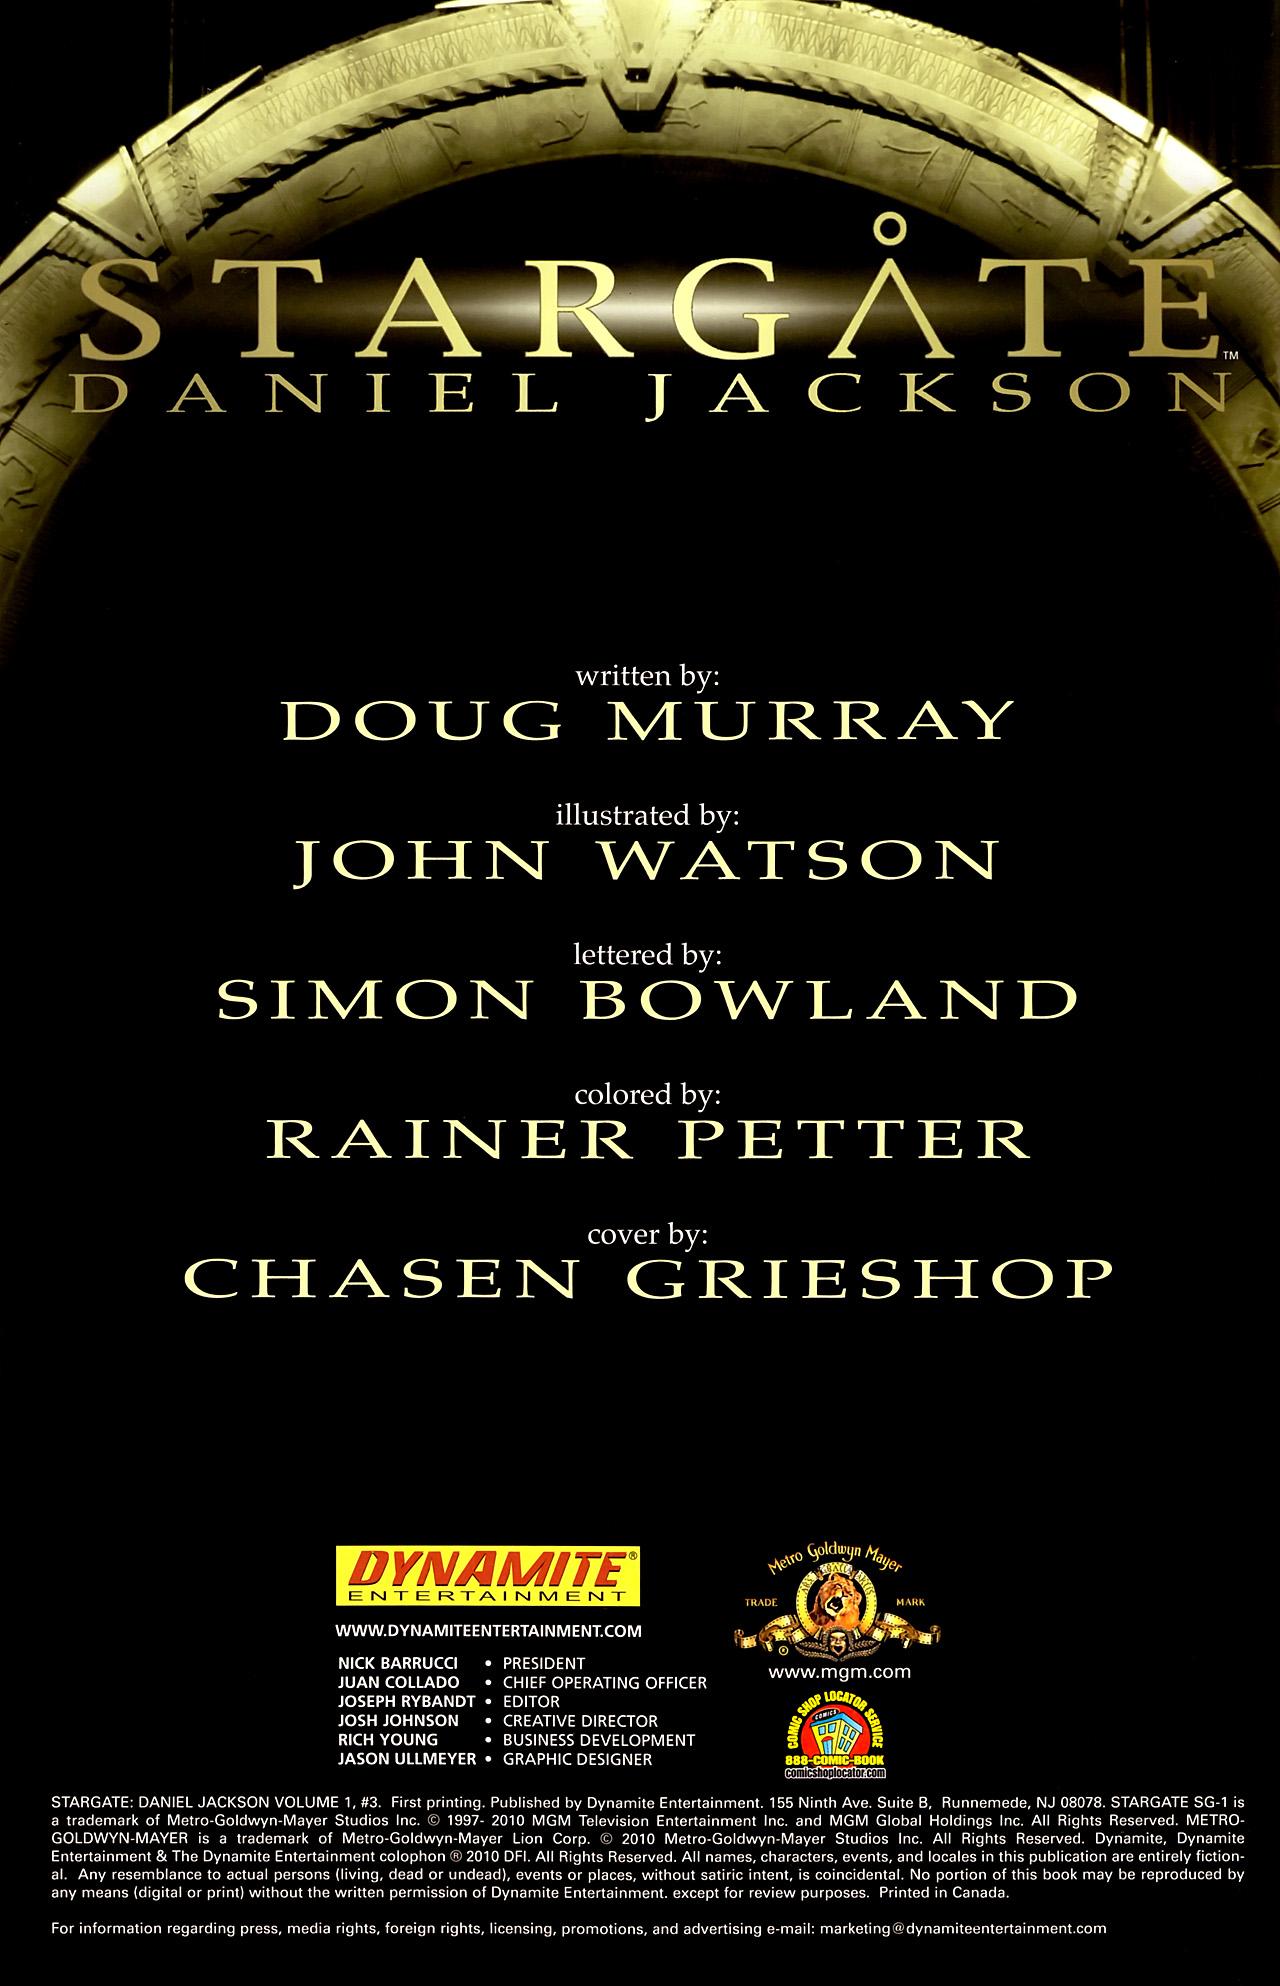 Read online Stargate: Daniel Jackson comic -  Issue #3 - 2